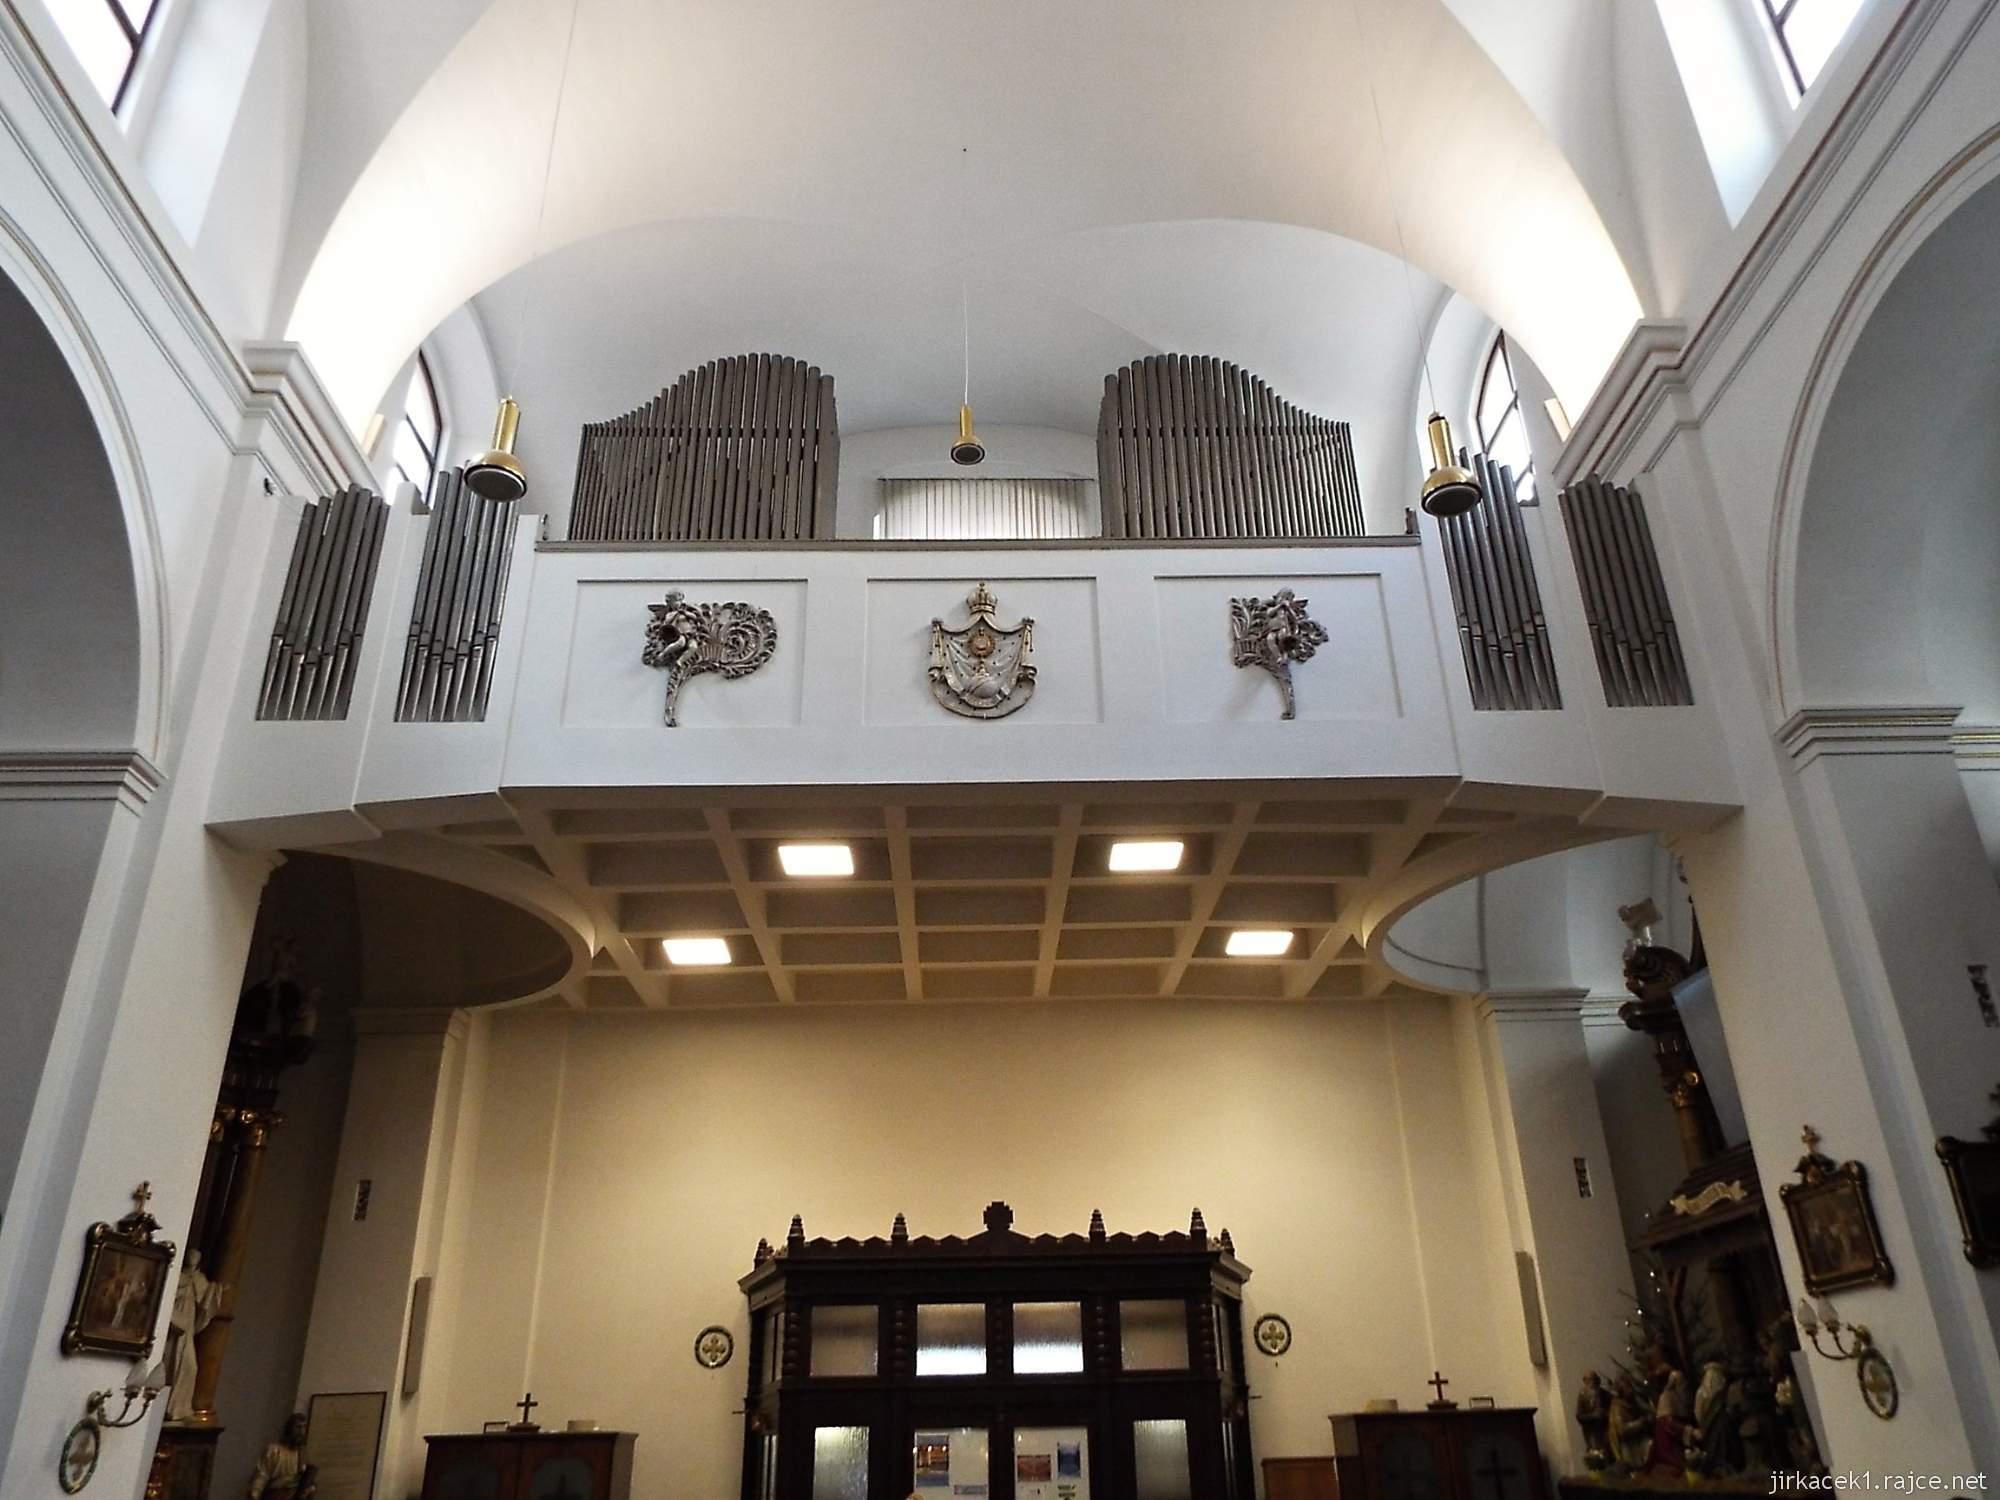 Brno - Kostel svaté Máří Magdalény - interiér - hudební kůr s varhanami